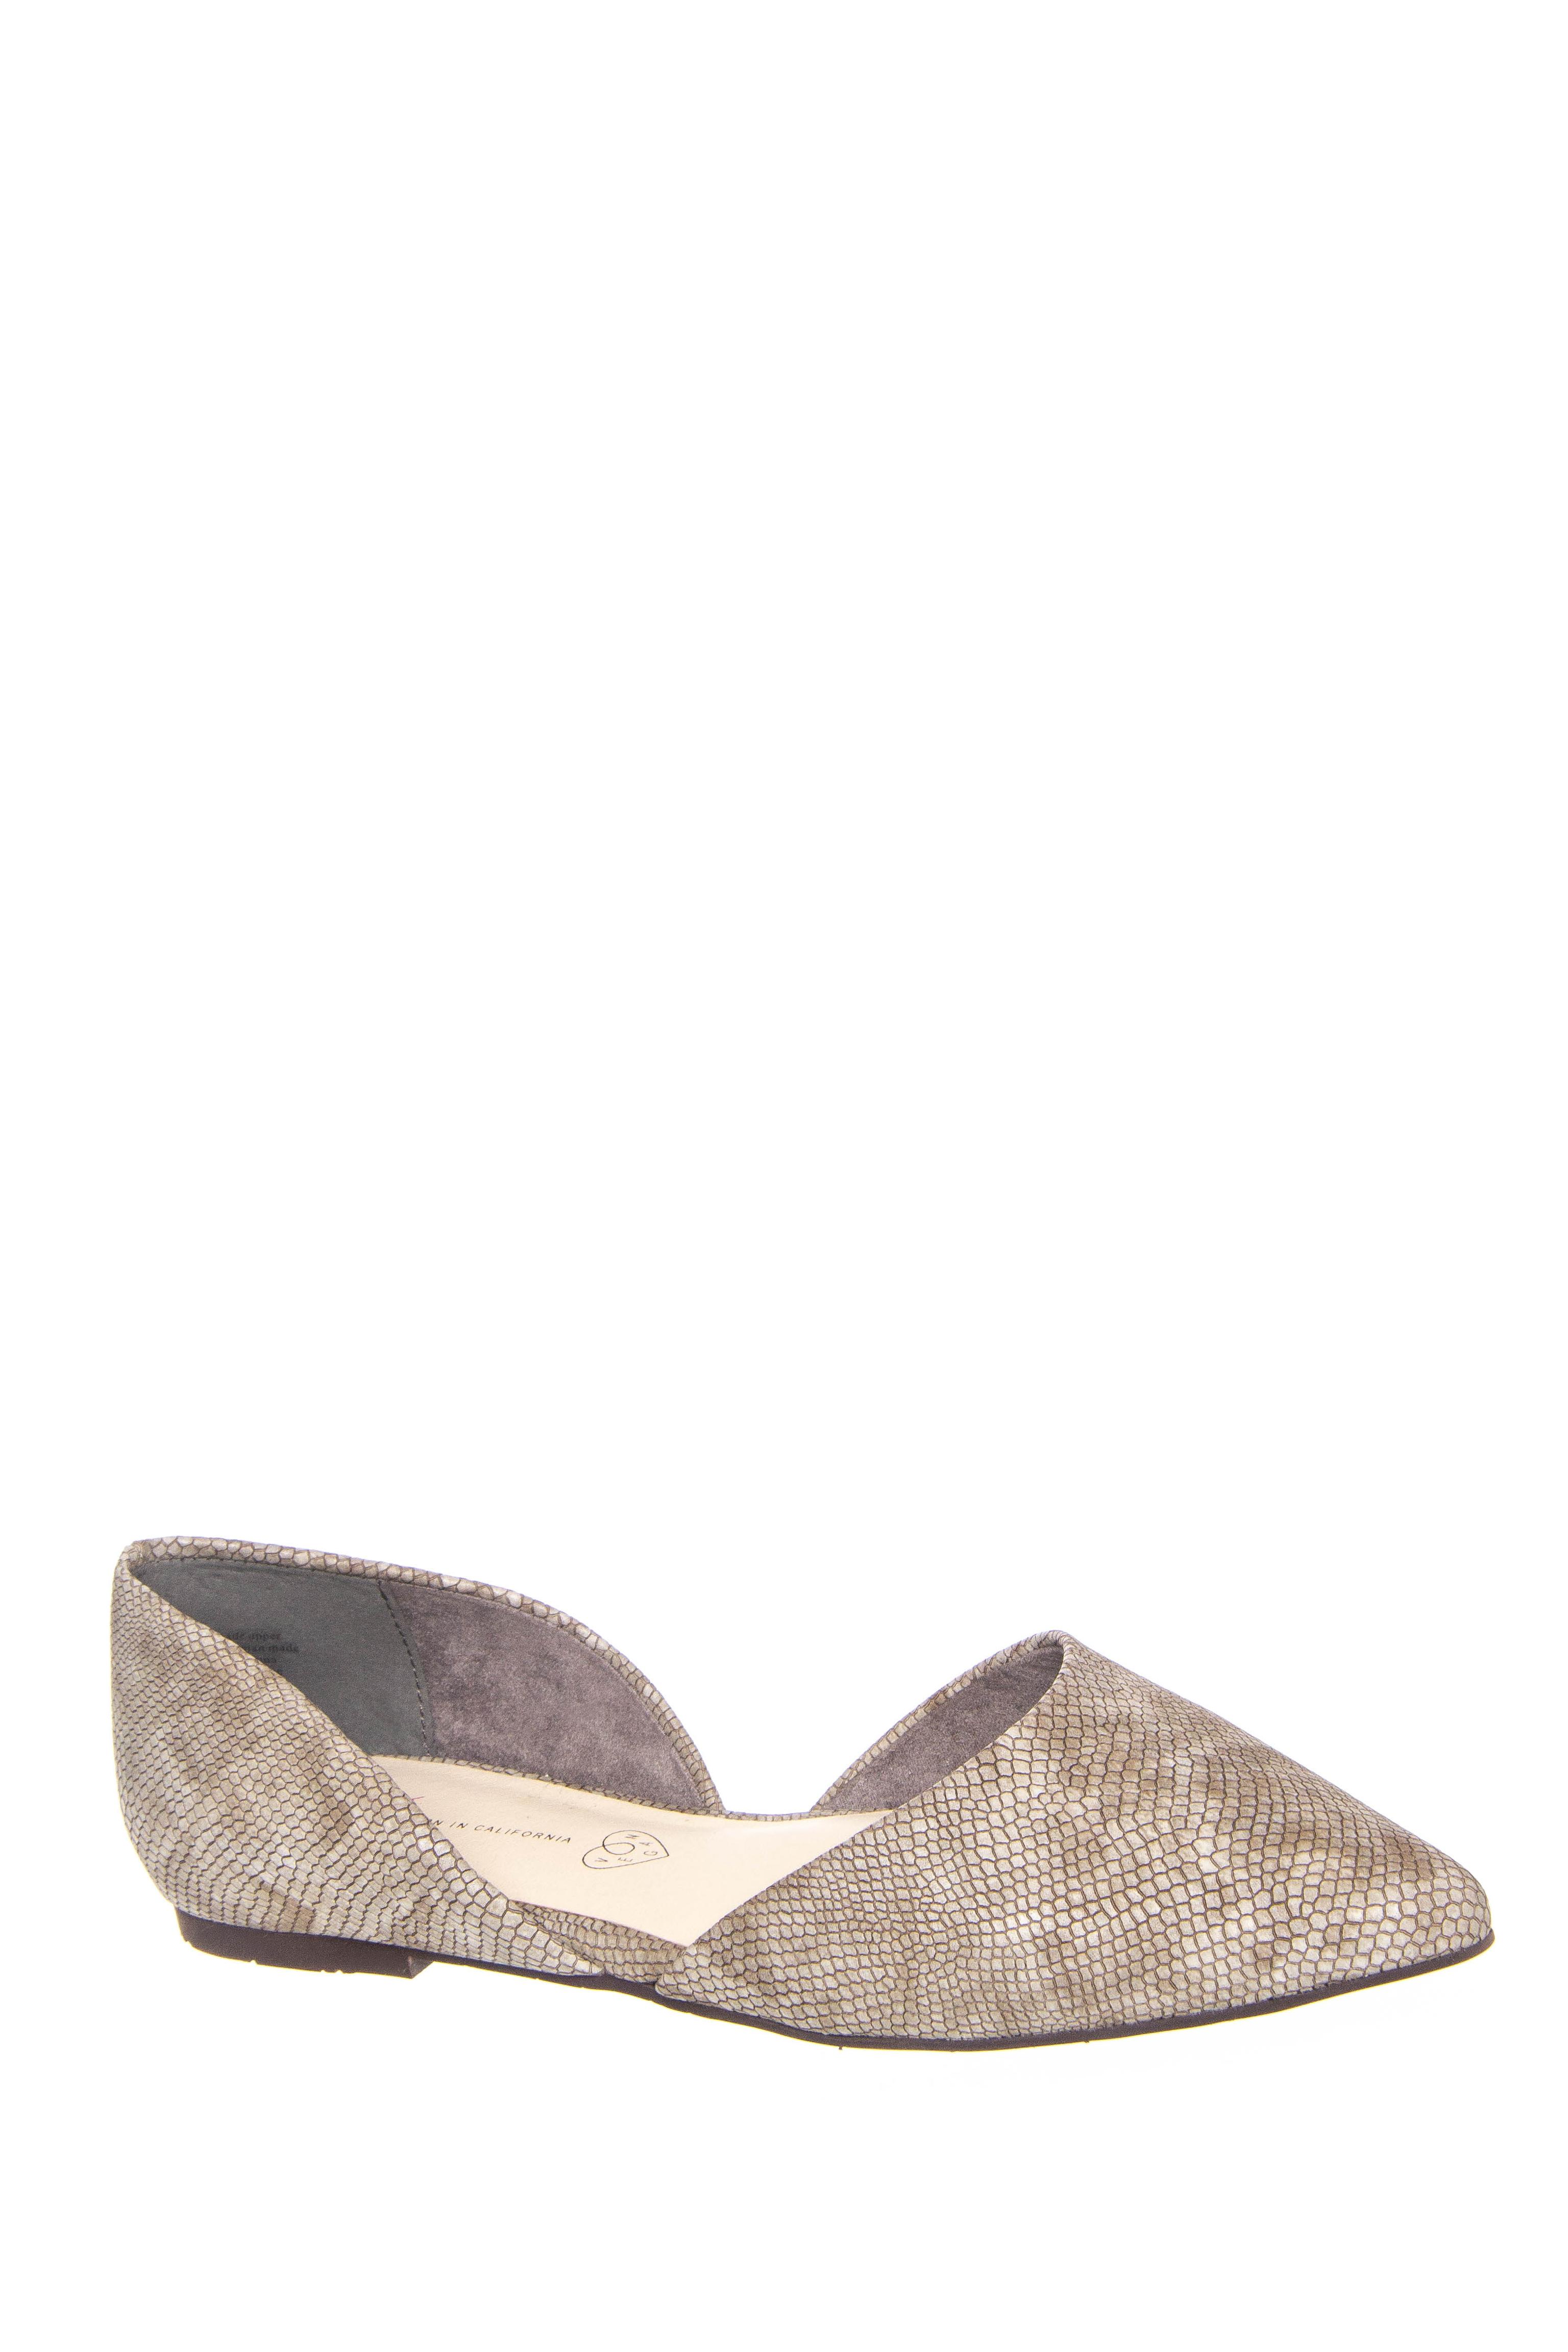 BC Footwear Society d'Orsay Flats - Grey Lizard